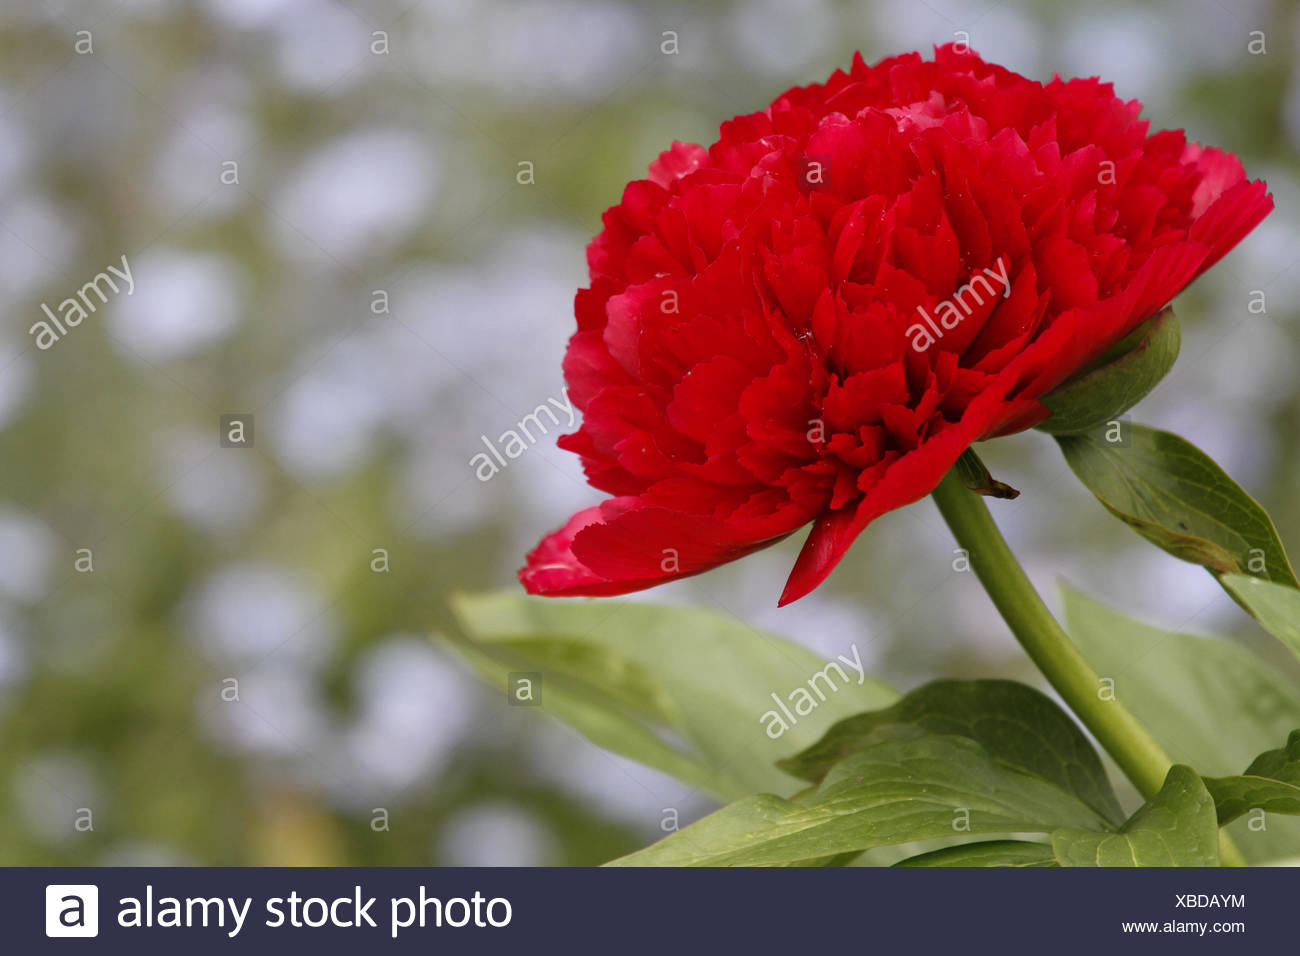 flower, plant, peony, romanticism, red, garden, flower, plant, peony, romantic, Stock Photo